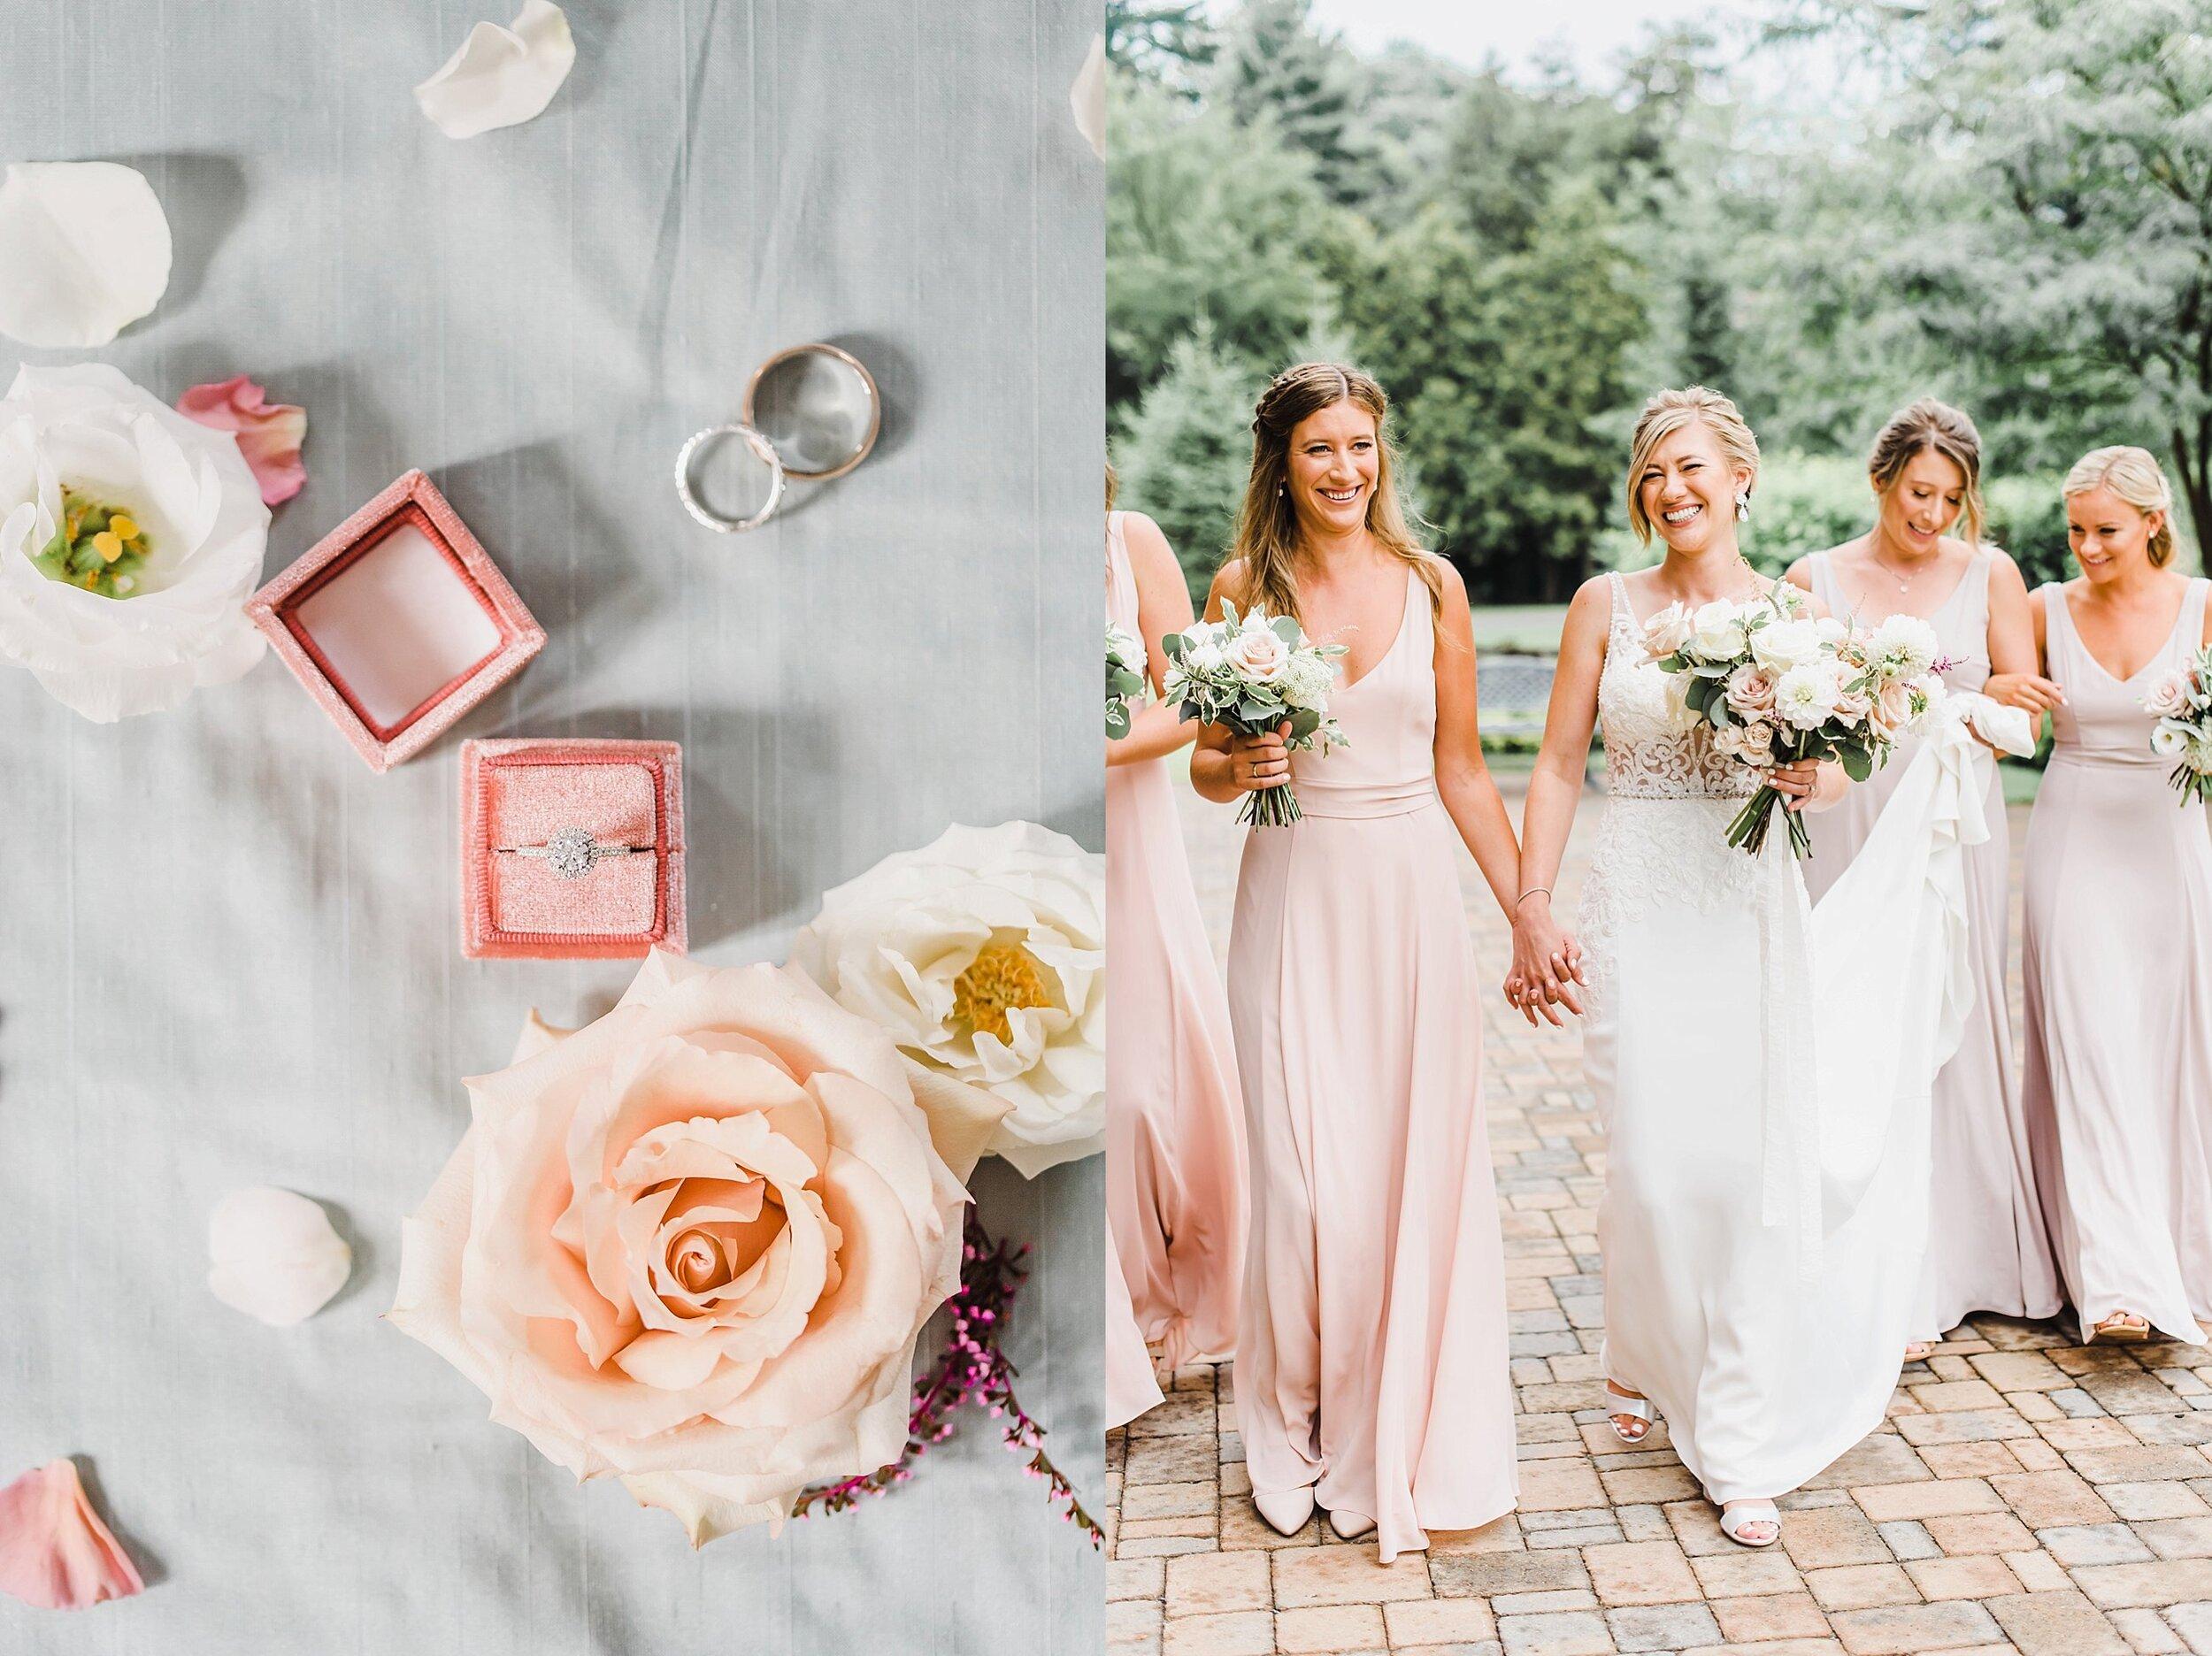 light airy fine art ottawa wedding photographer | Ali and Batoul Photography | Fairmont Le Chateau Montebello24.jpg